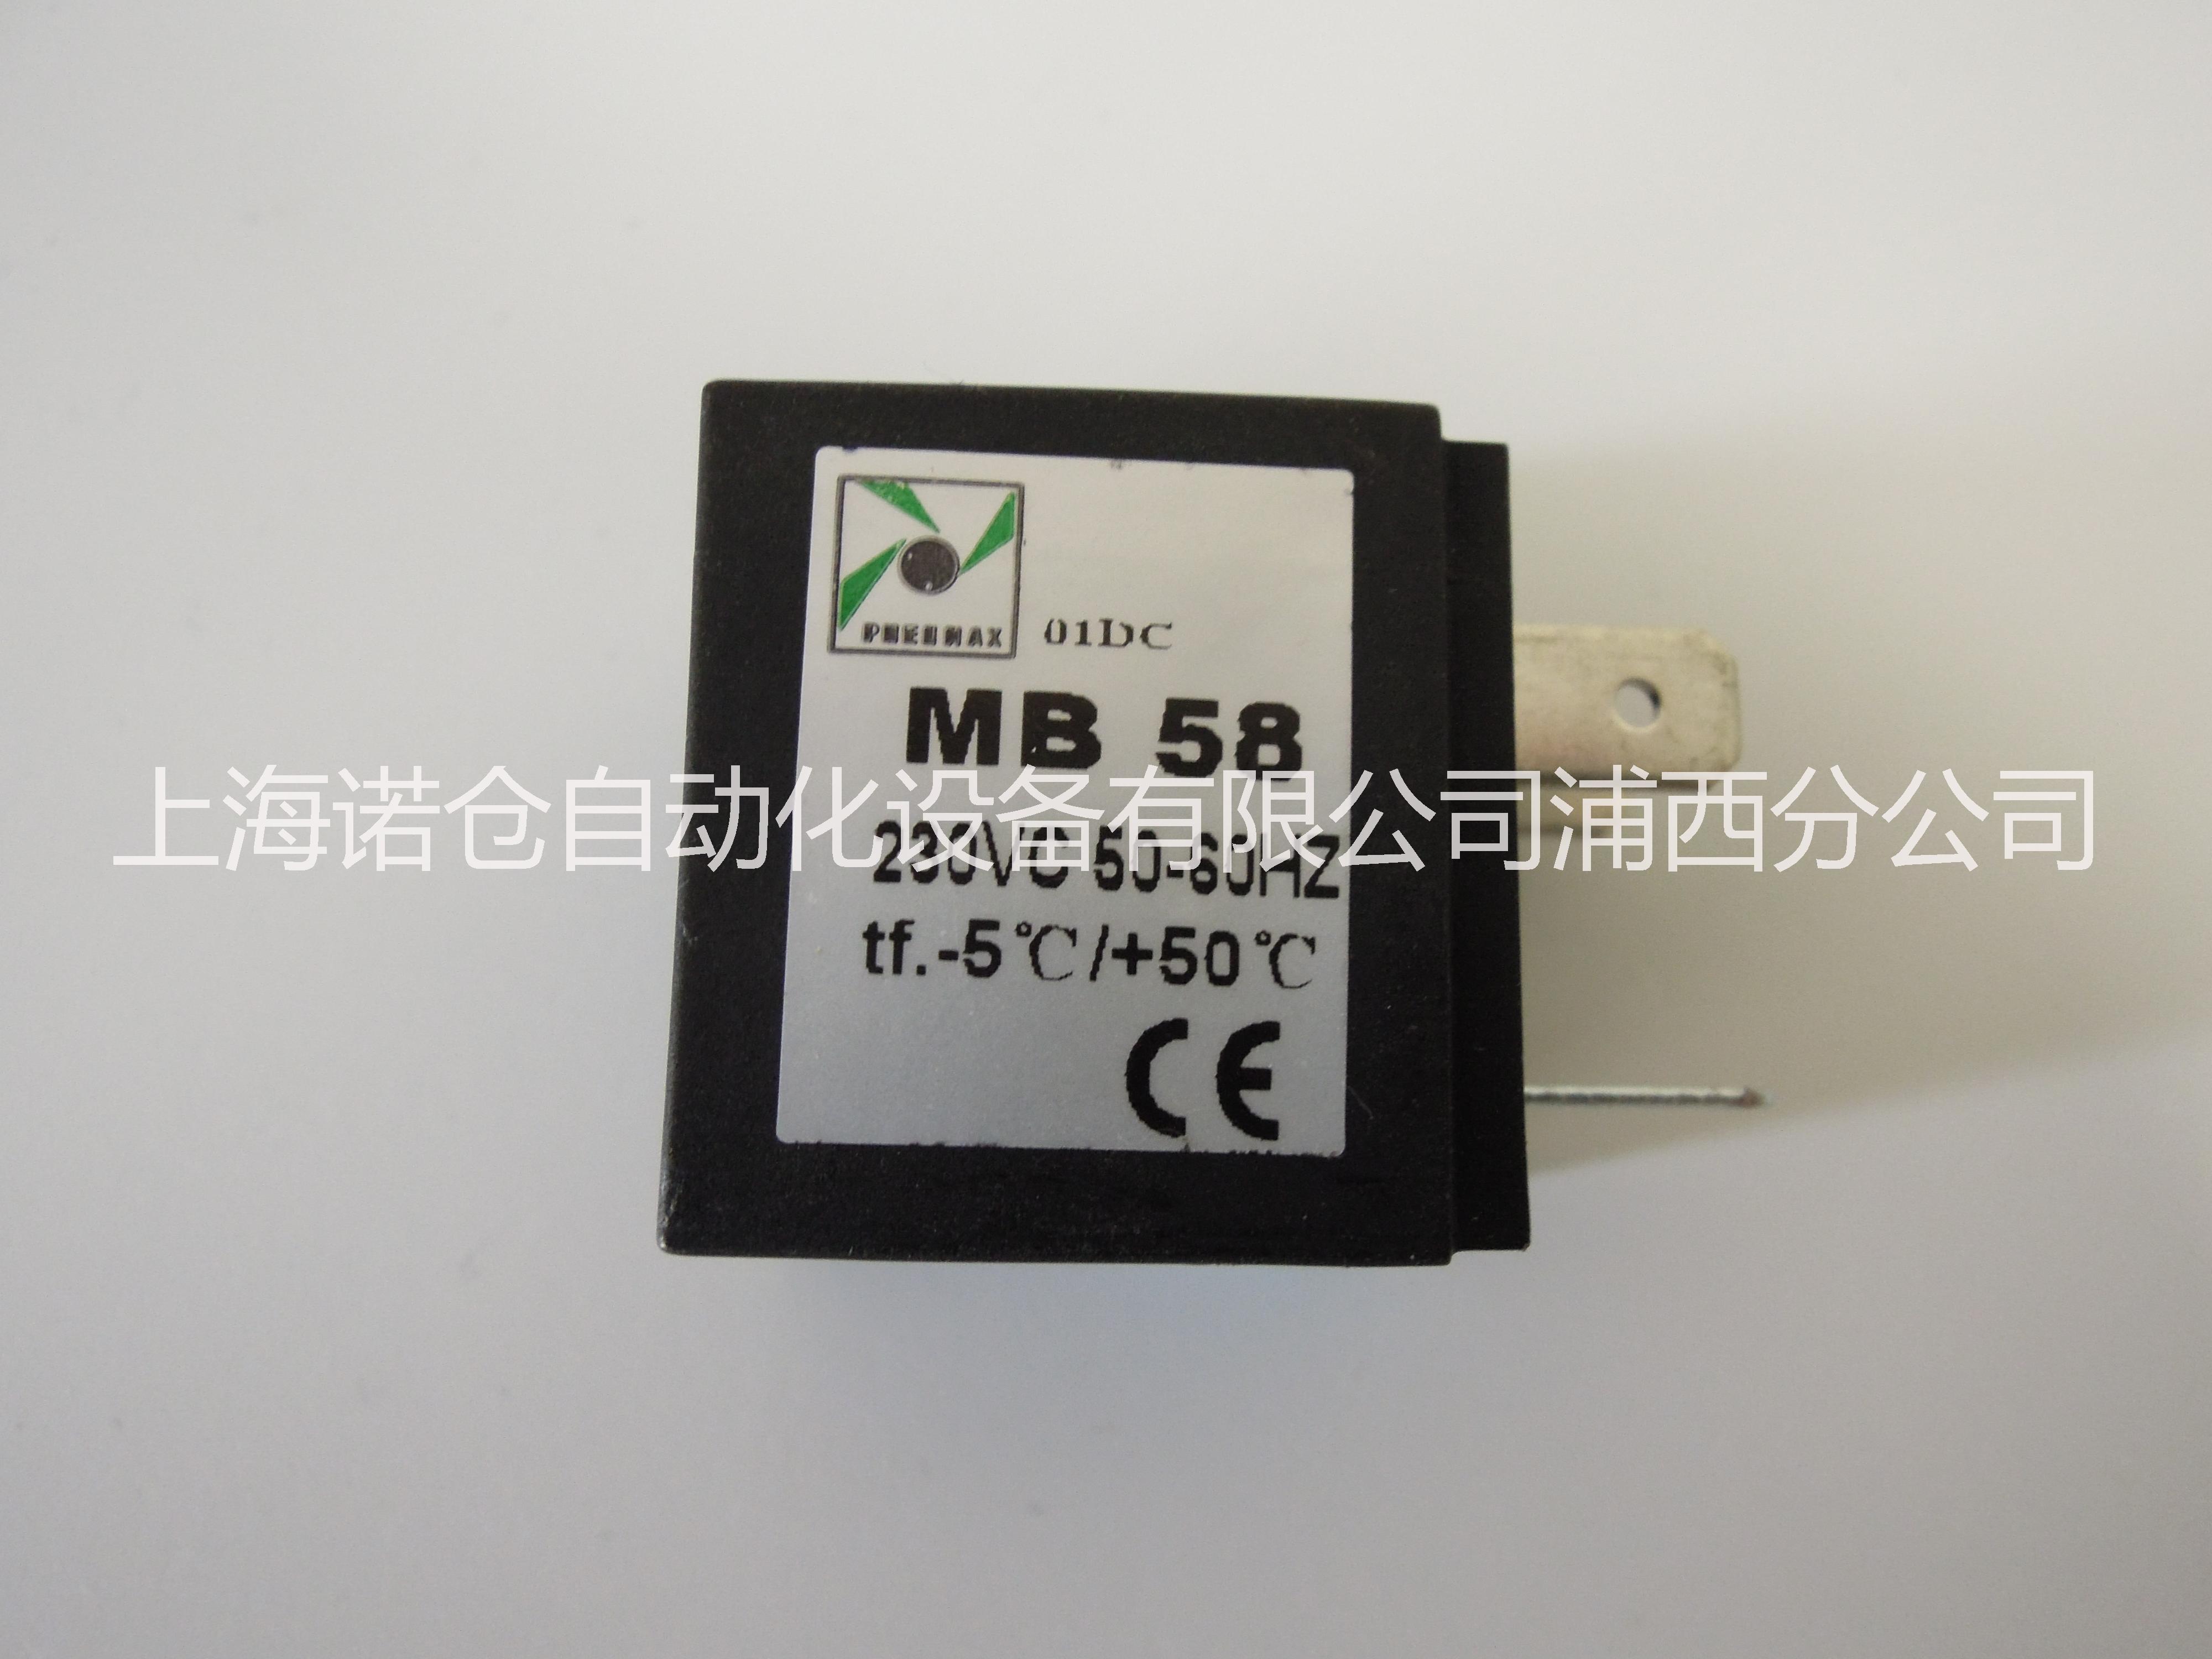 现货供应PNEUMAX电磁阀线圈MB57 110V,MB58 220V,MB56/1